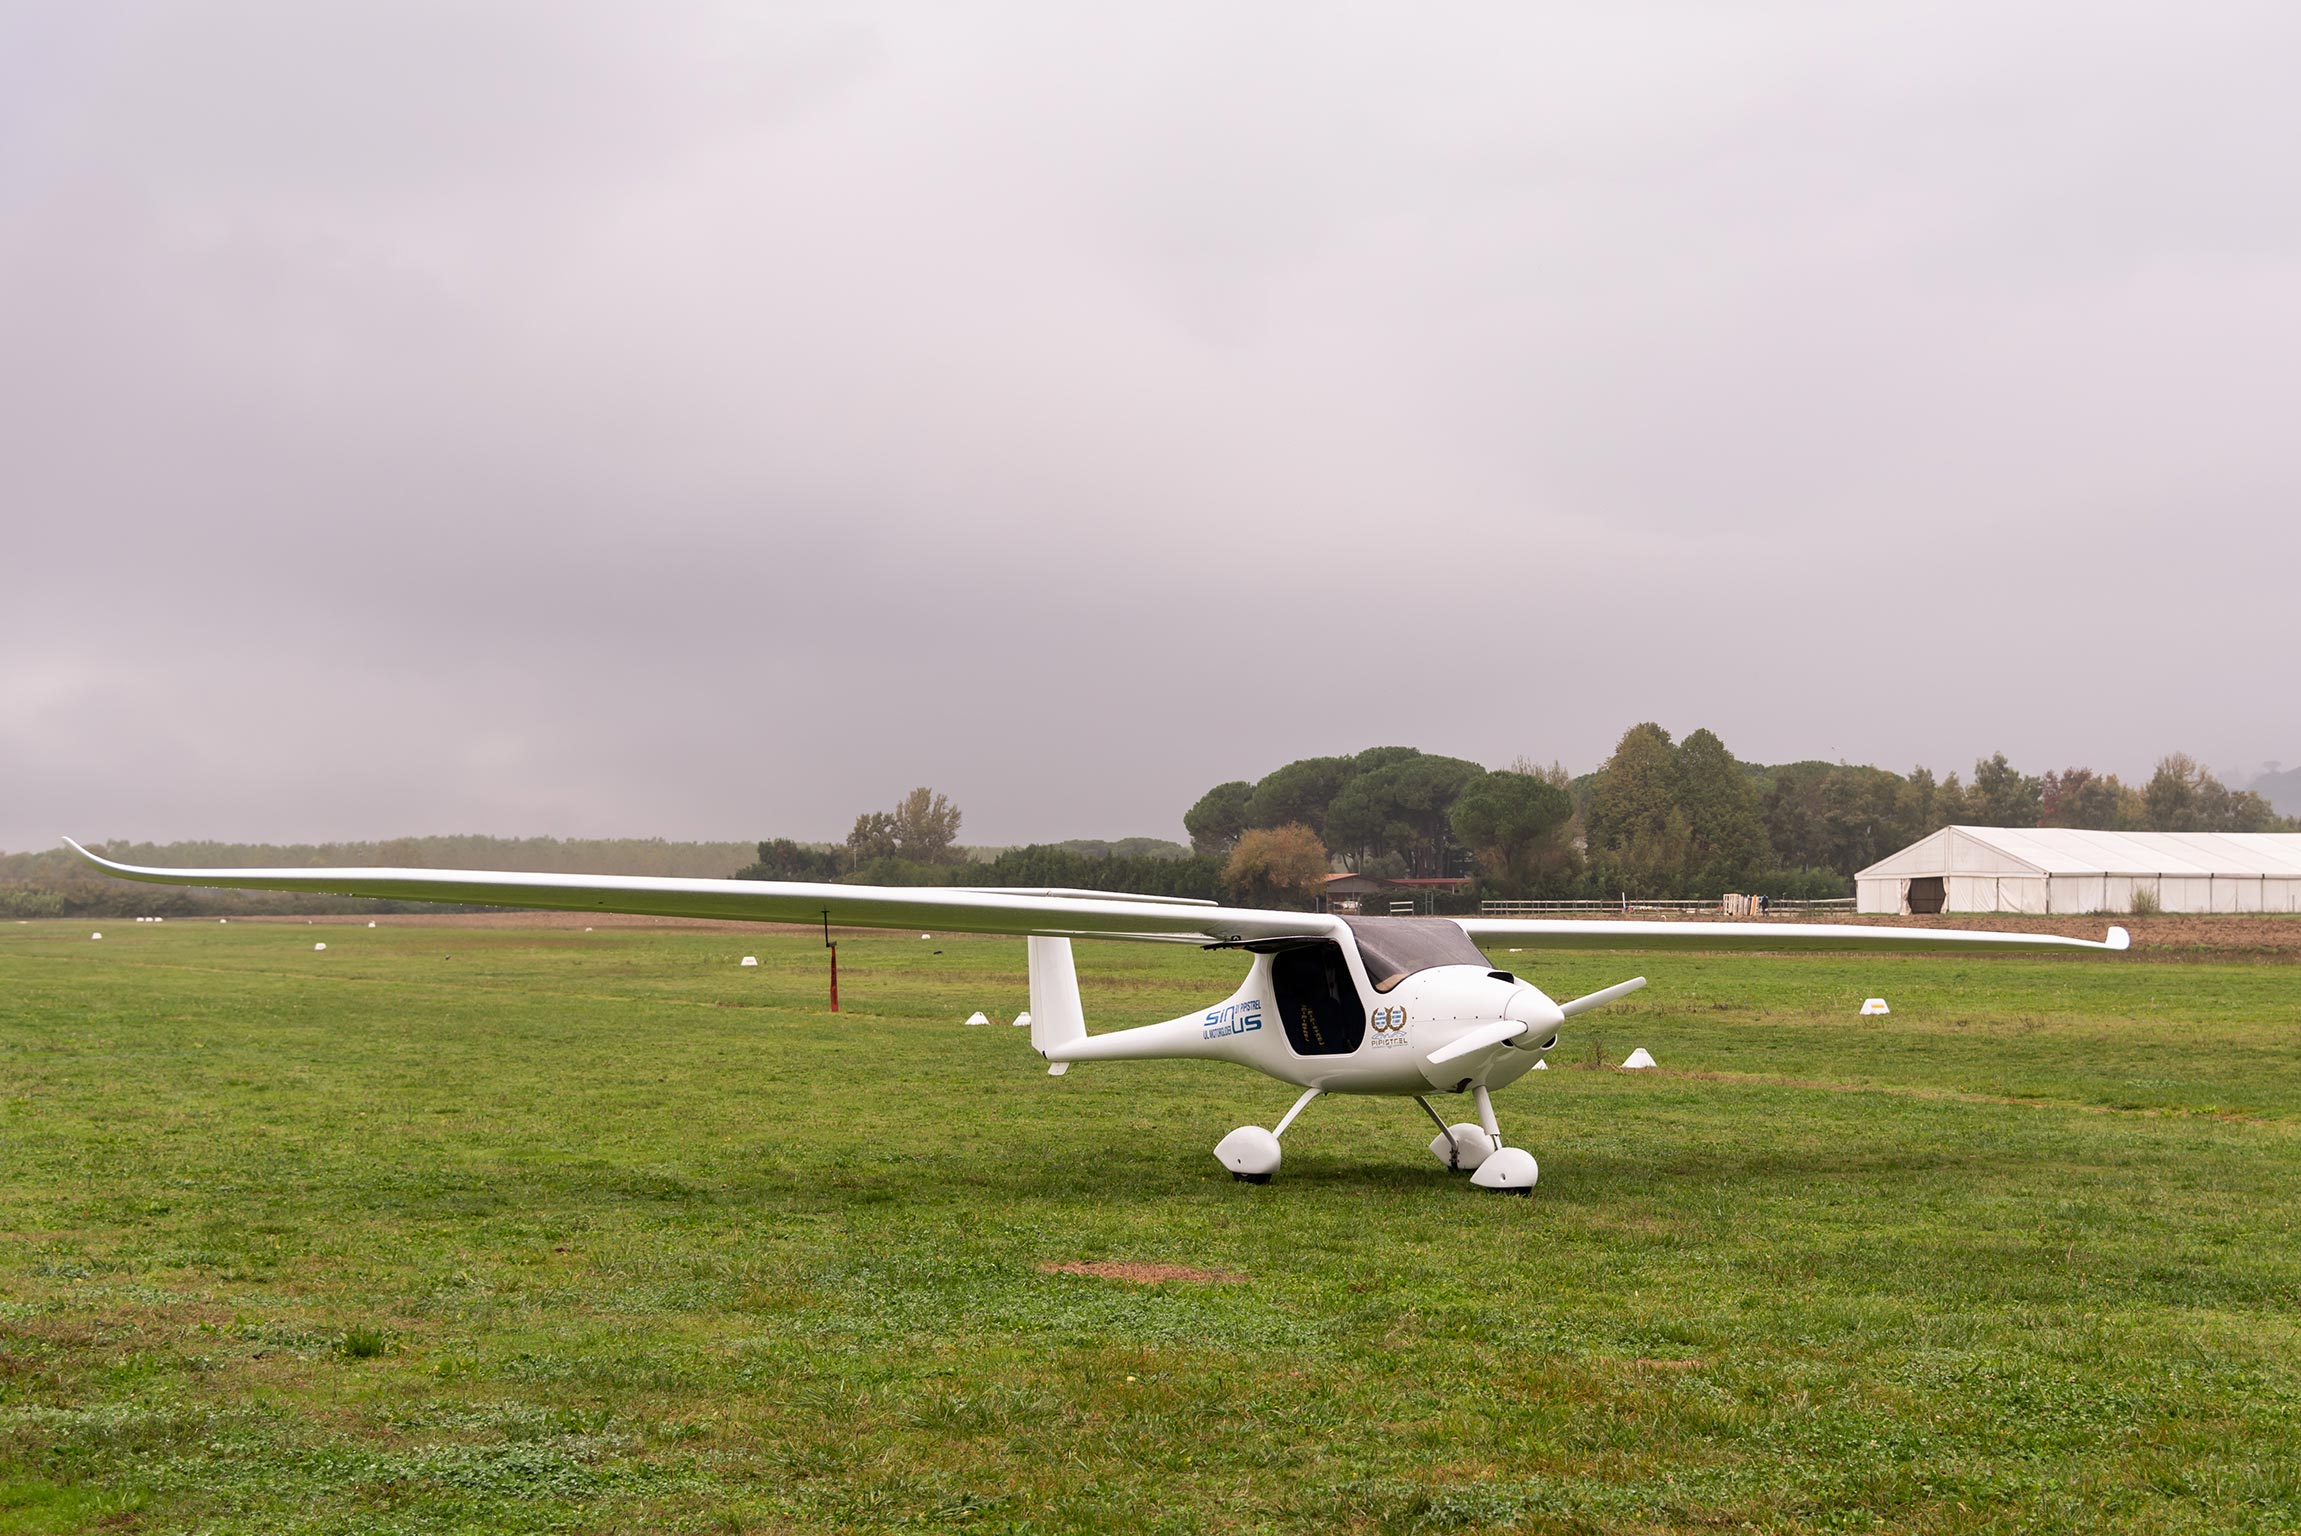 Esperienze in Toscana: volo in ultraleggero dall'Aviosuperficie Valdera